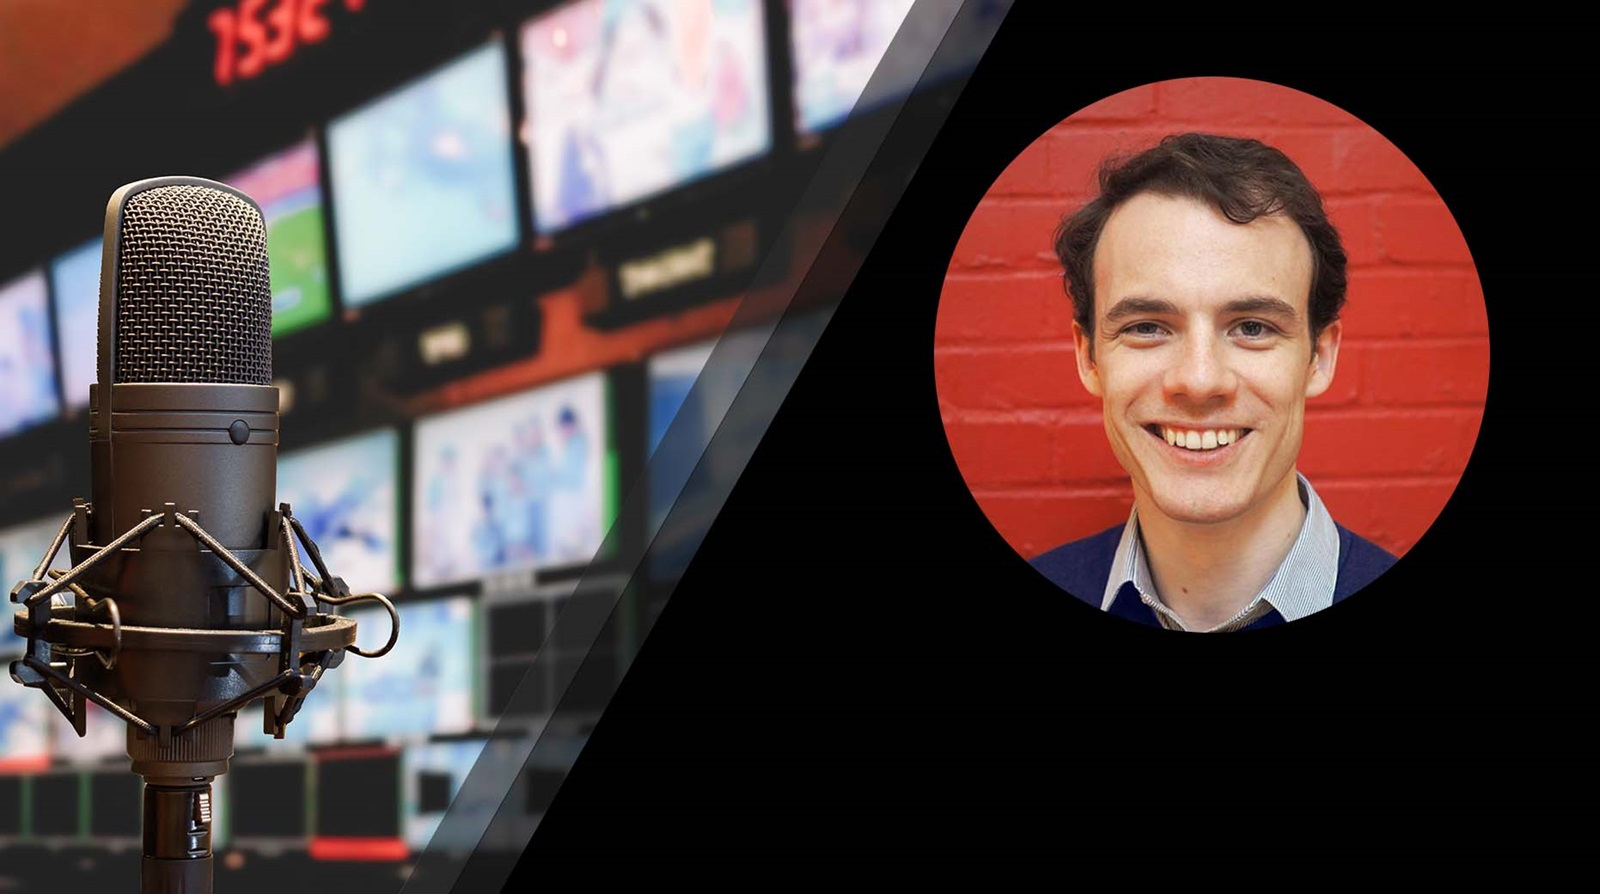 Felix Simon on the Making the Media podcast